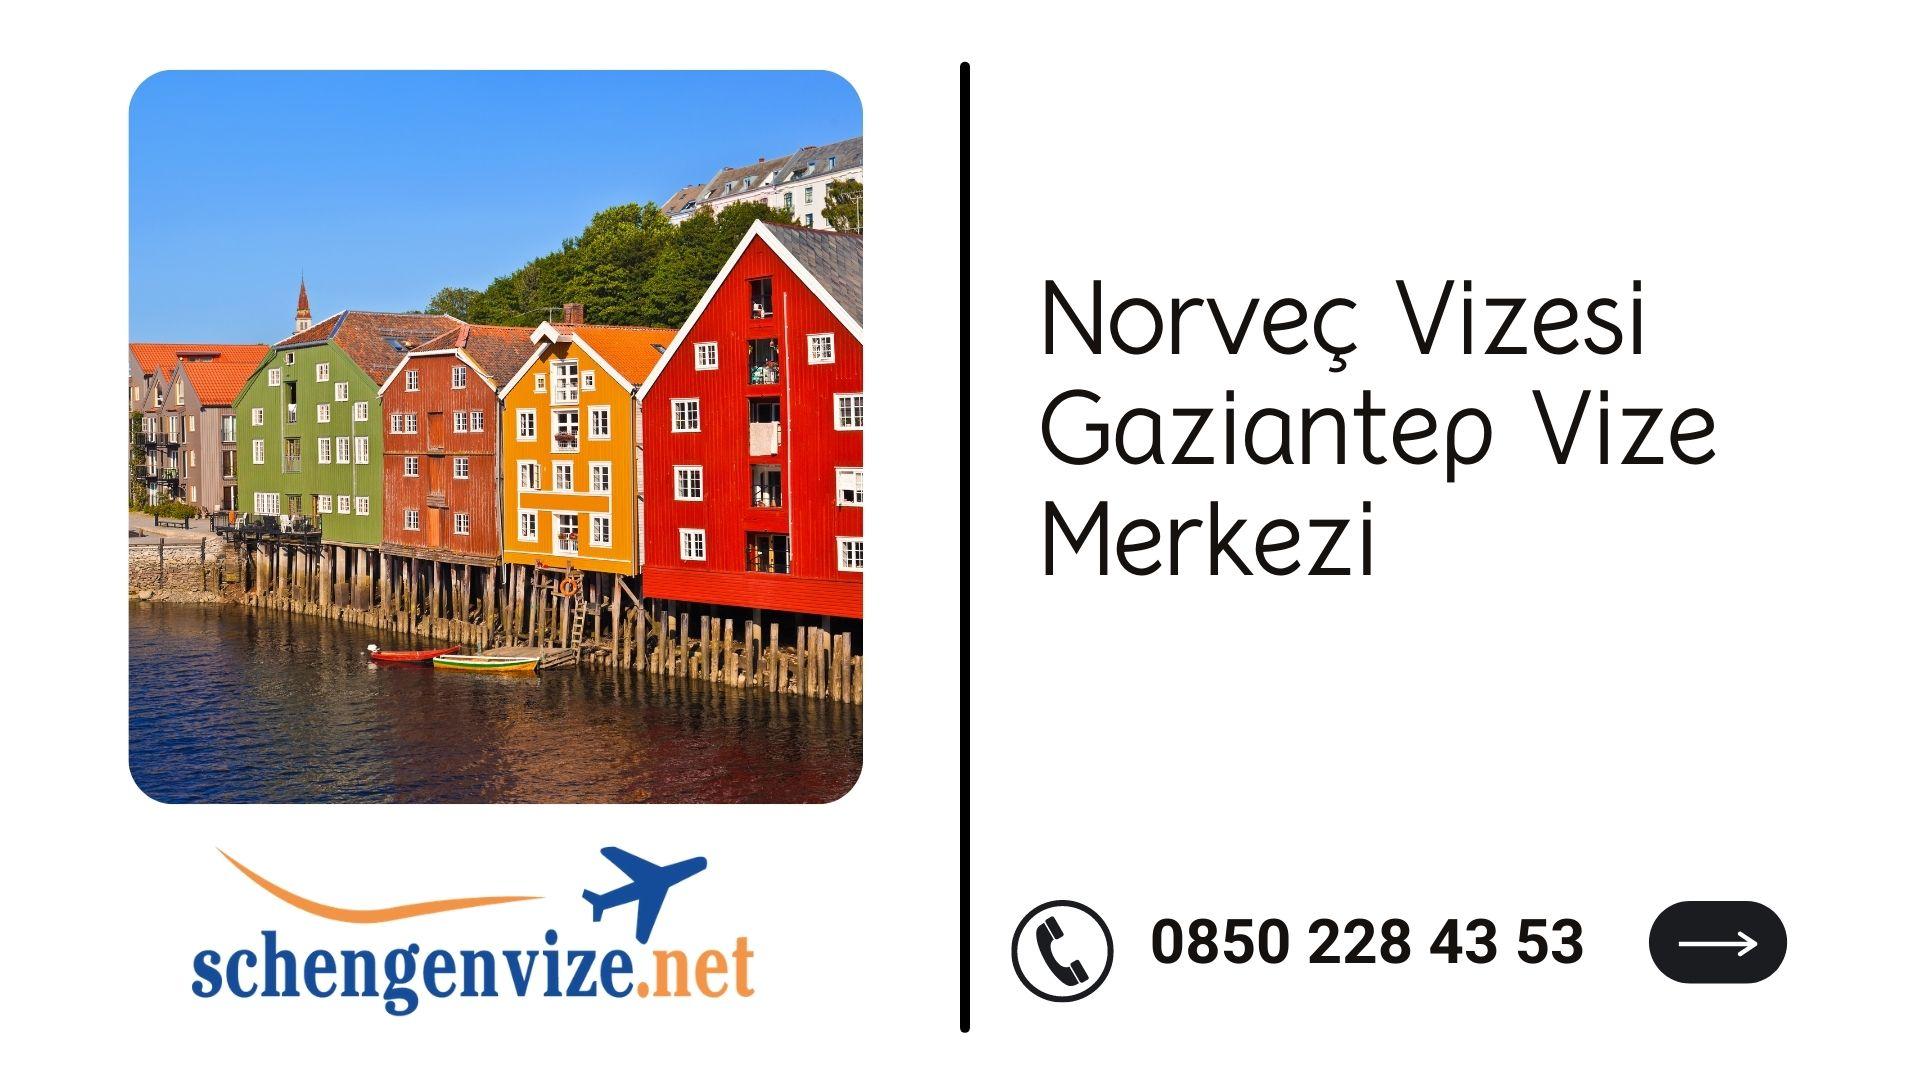 Norveç Vizesi Gaziantep Vize Merkezi